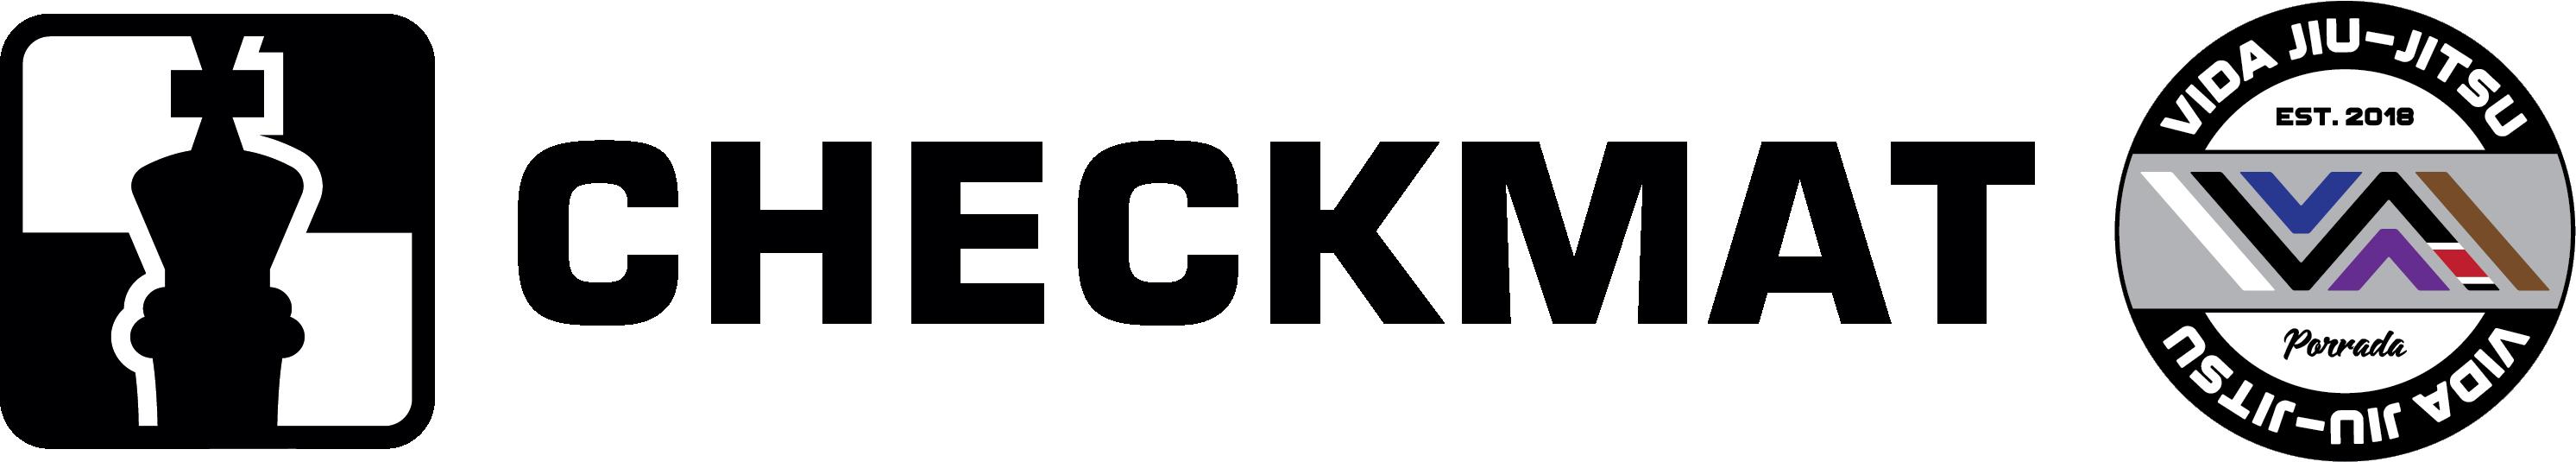 Checkmat Banner Website